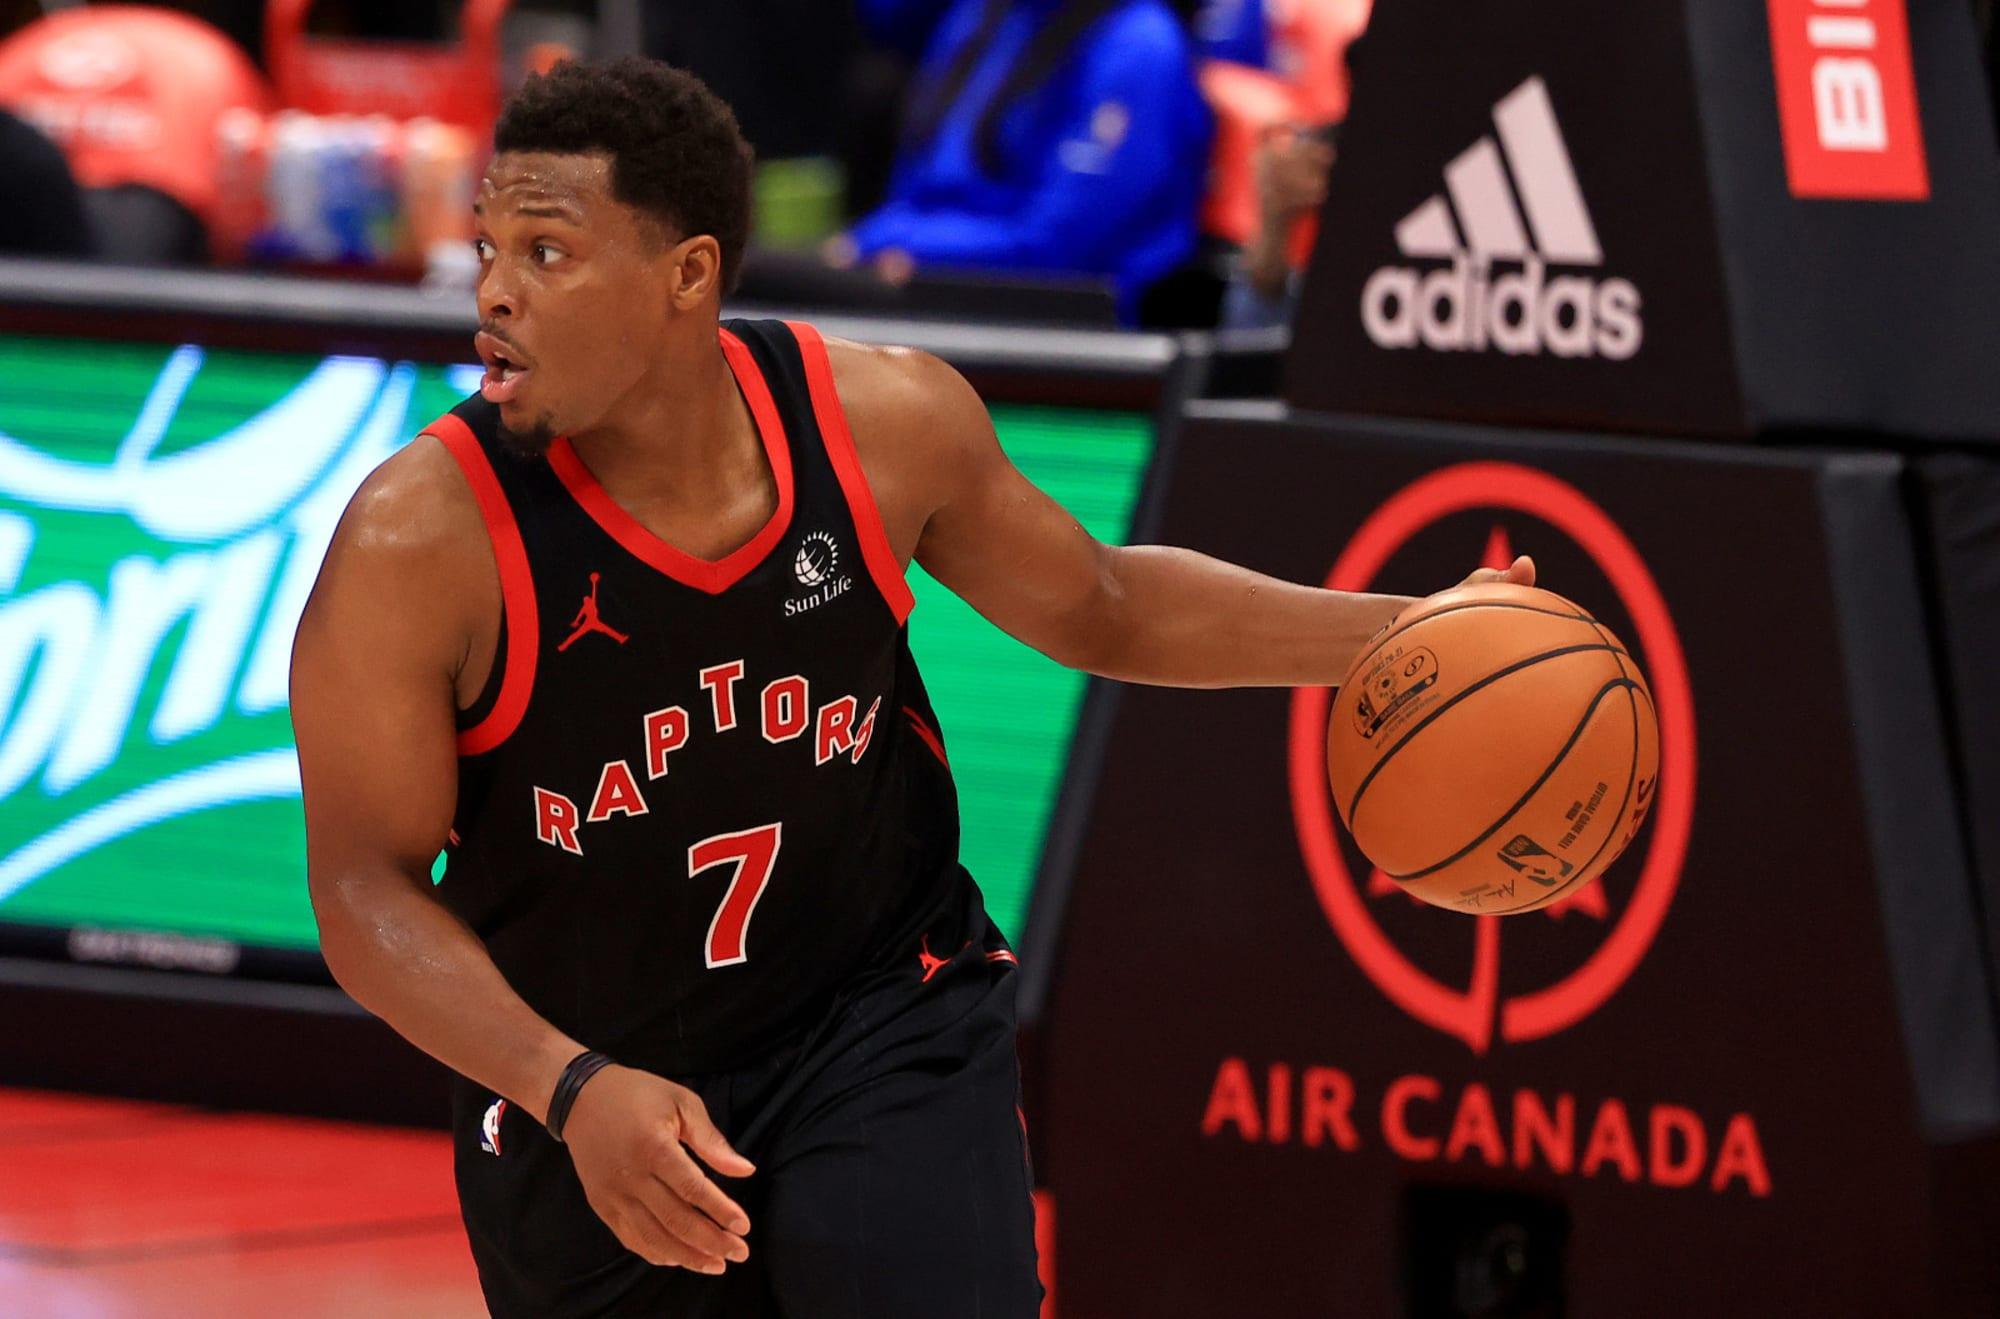 Toronto Raptors: 4 biggest improvements to make after one month of 2020-21 season